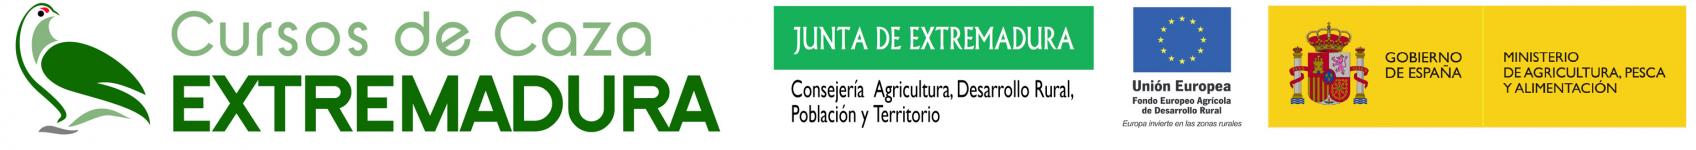 Logo of Cursos Caza Extremadura